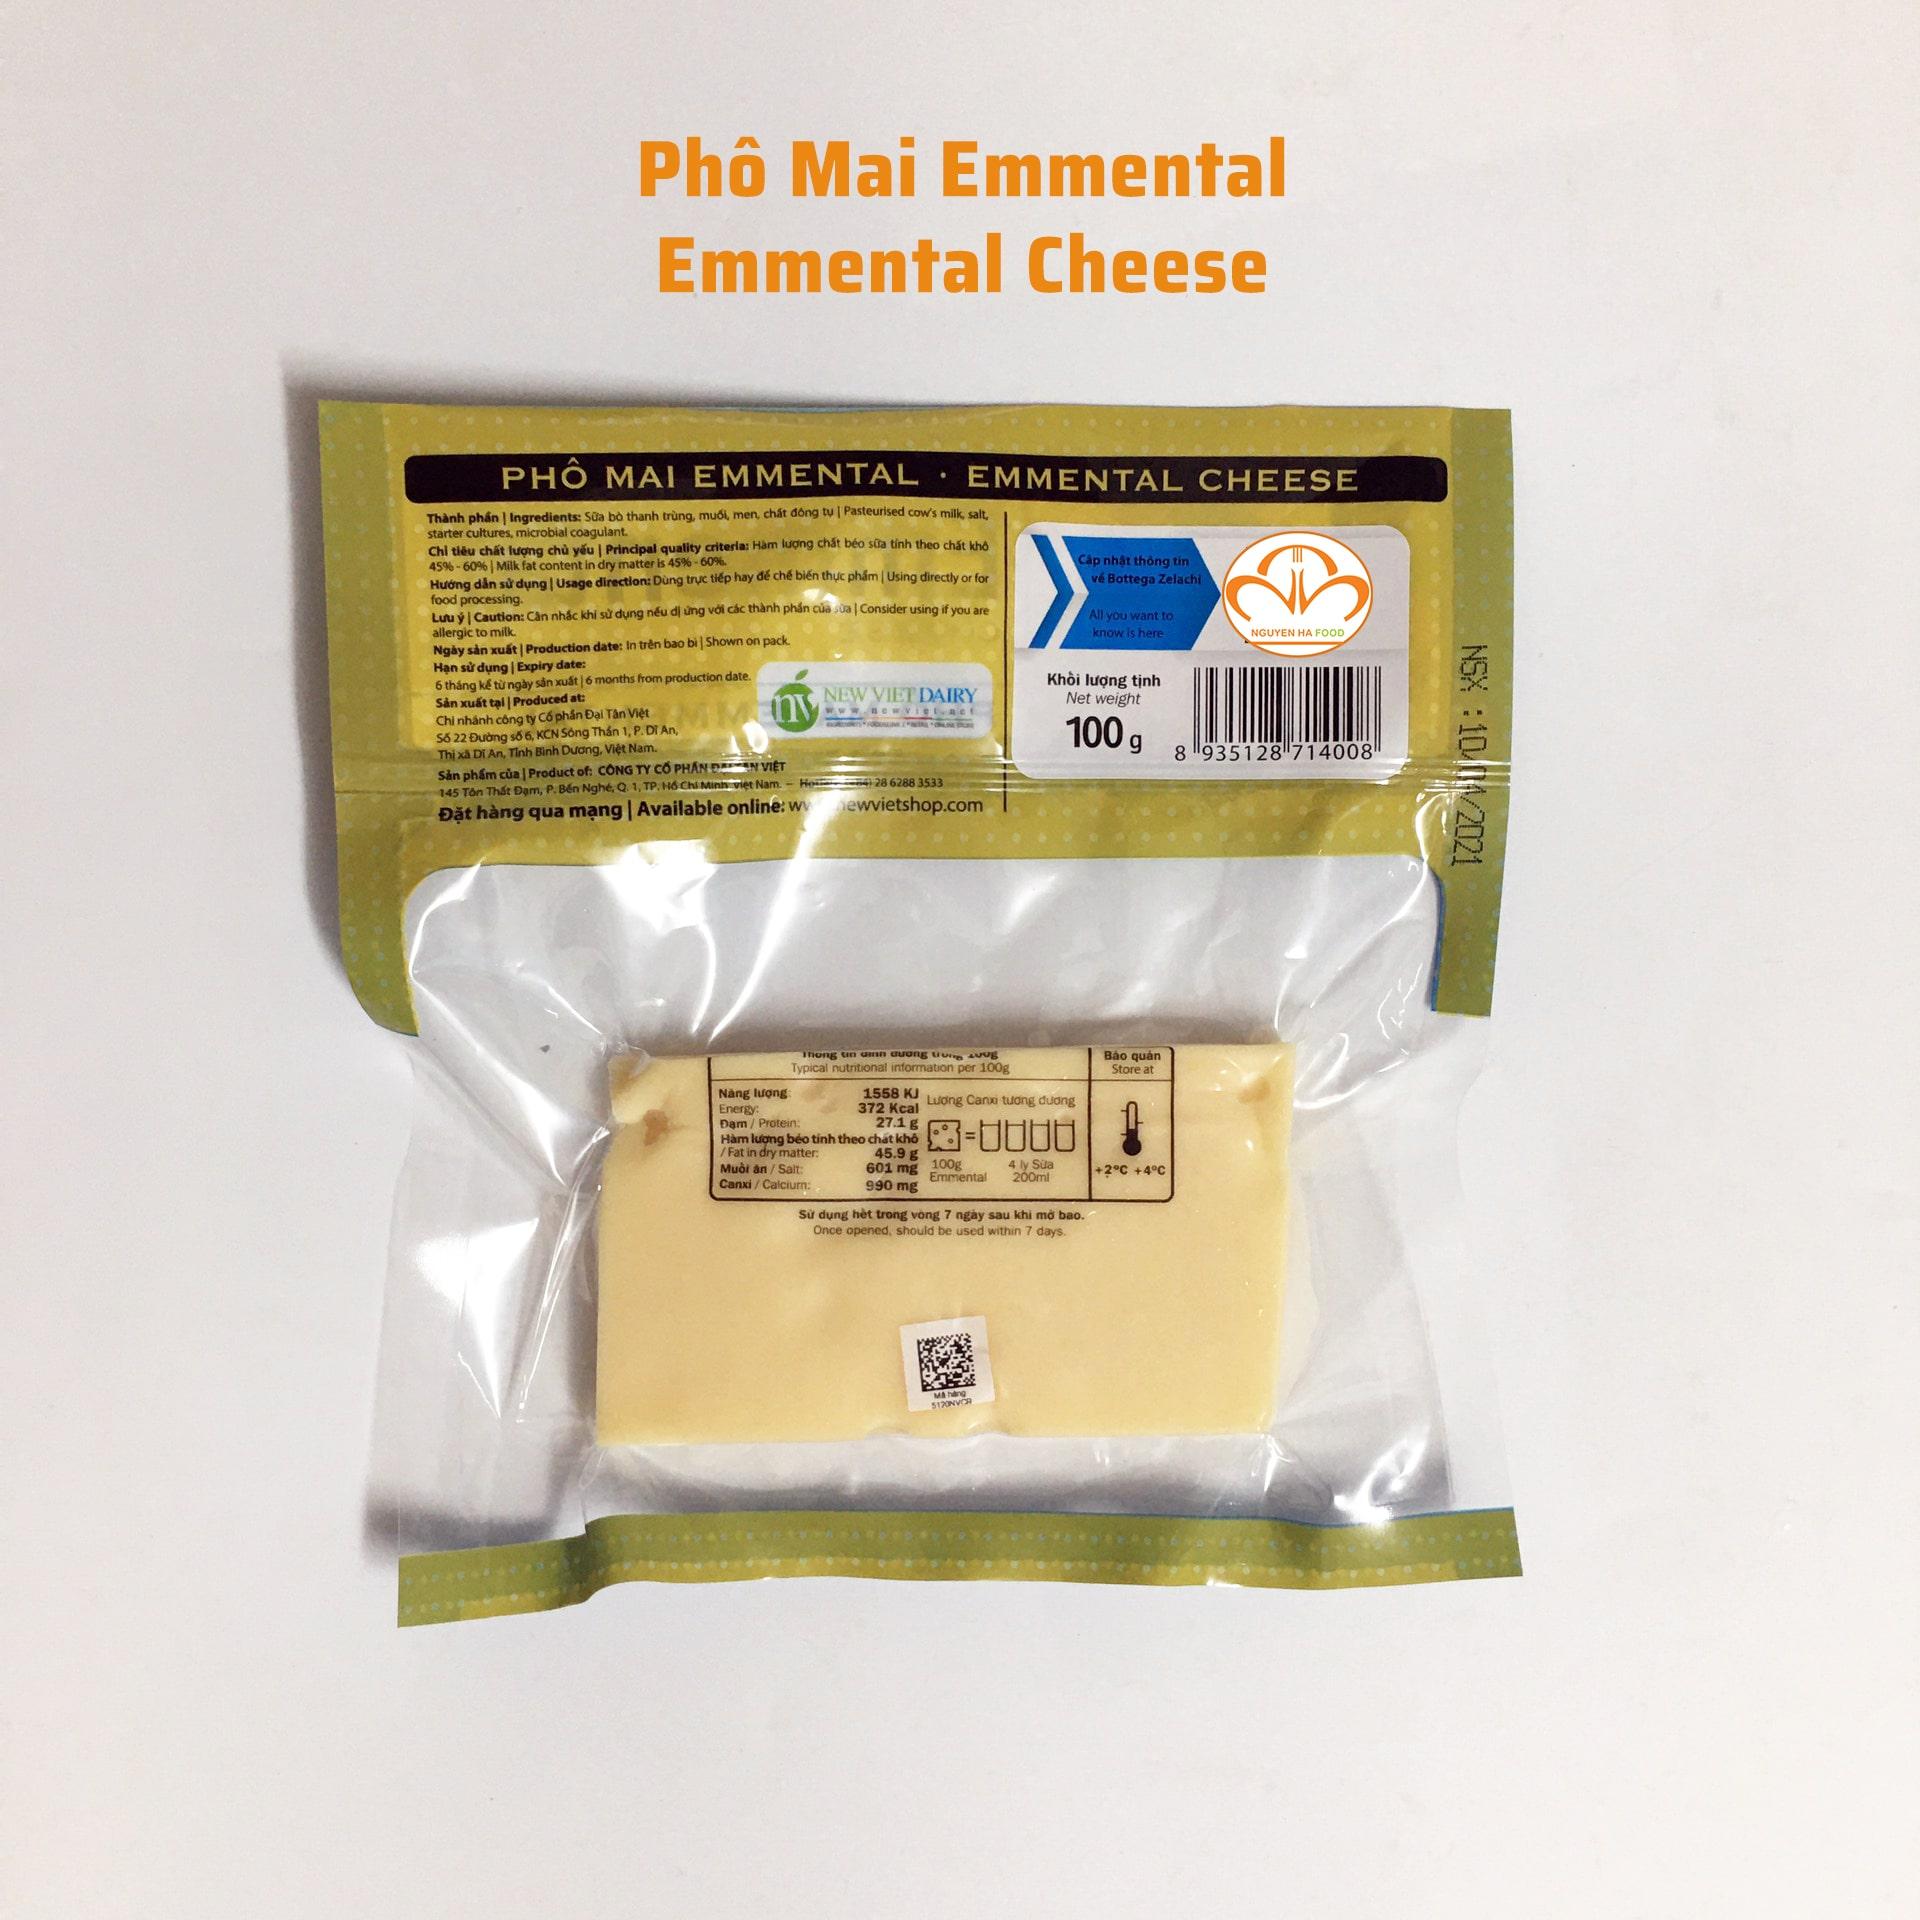 pho-mai-emmental-emmental-cheese